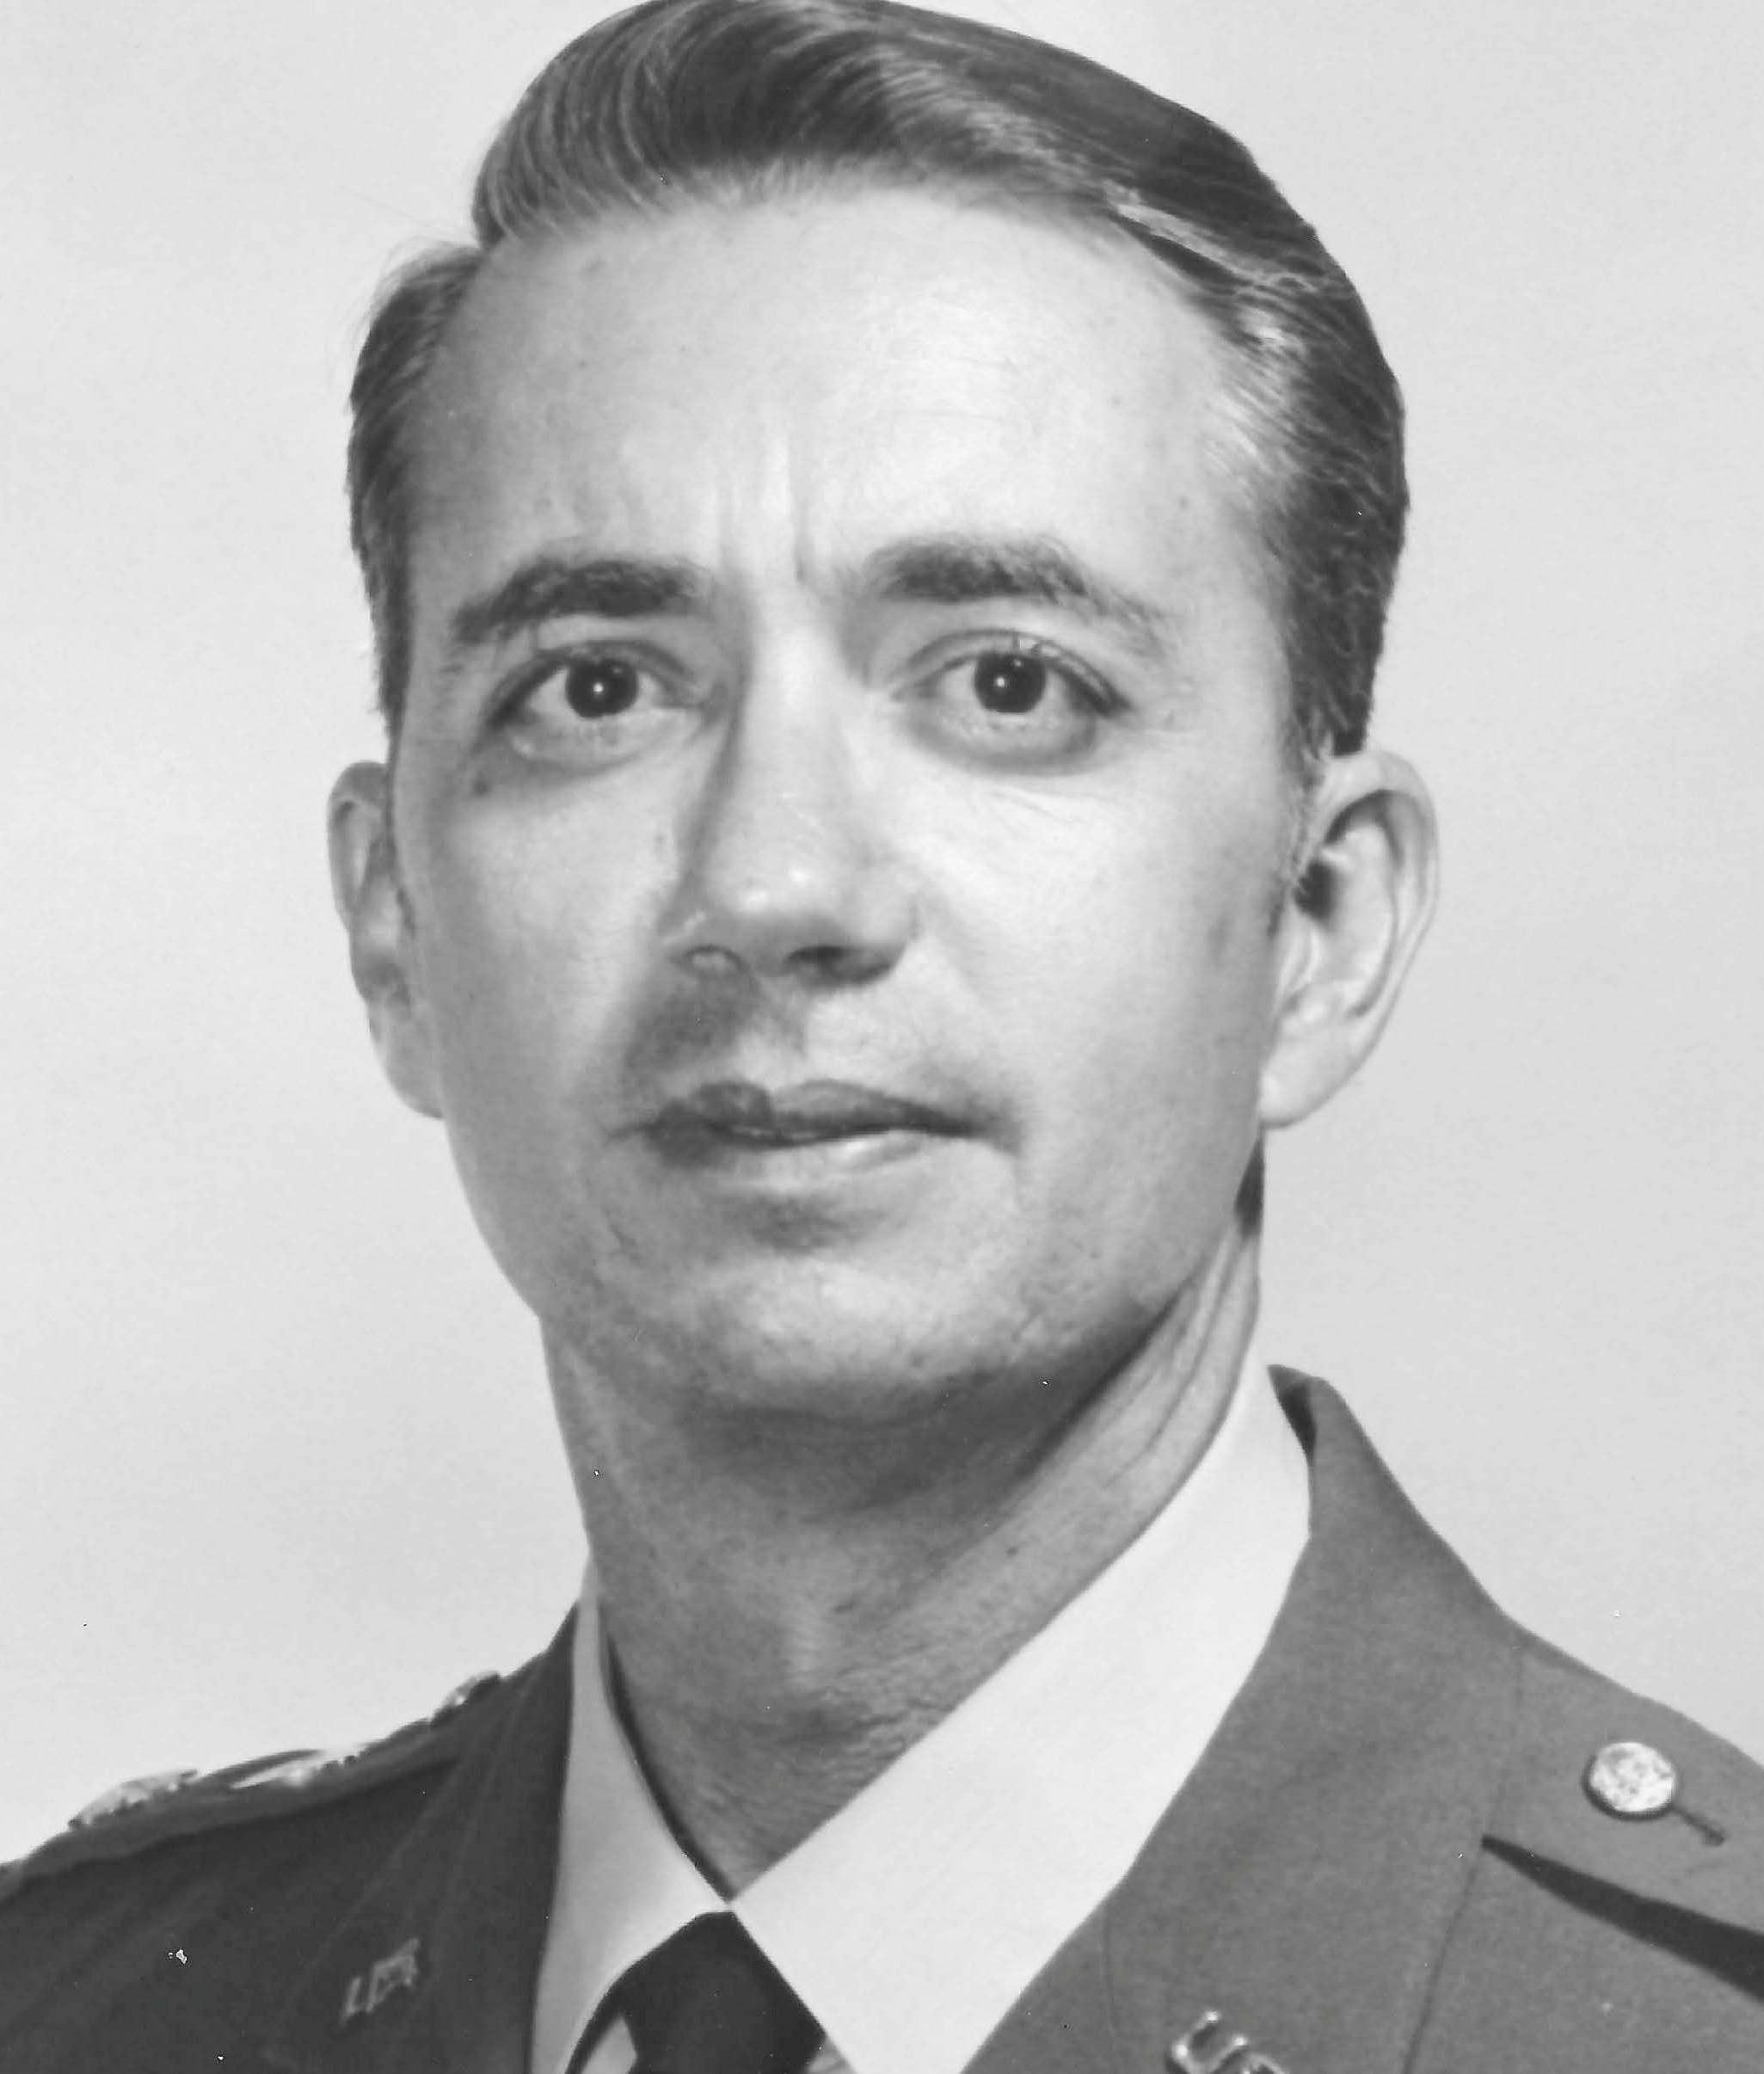 George Gonsalves